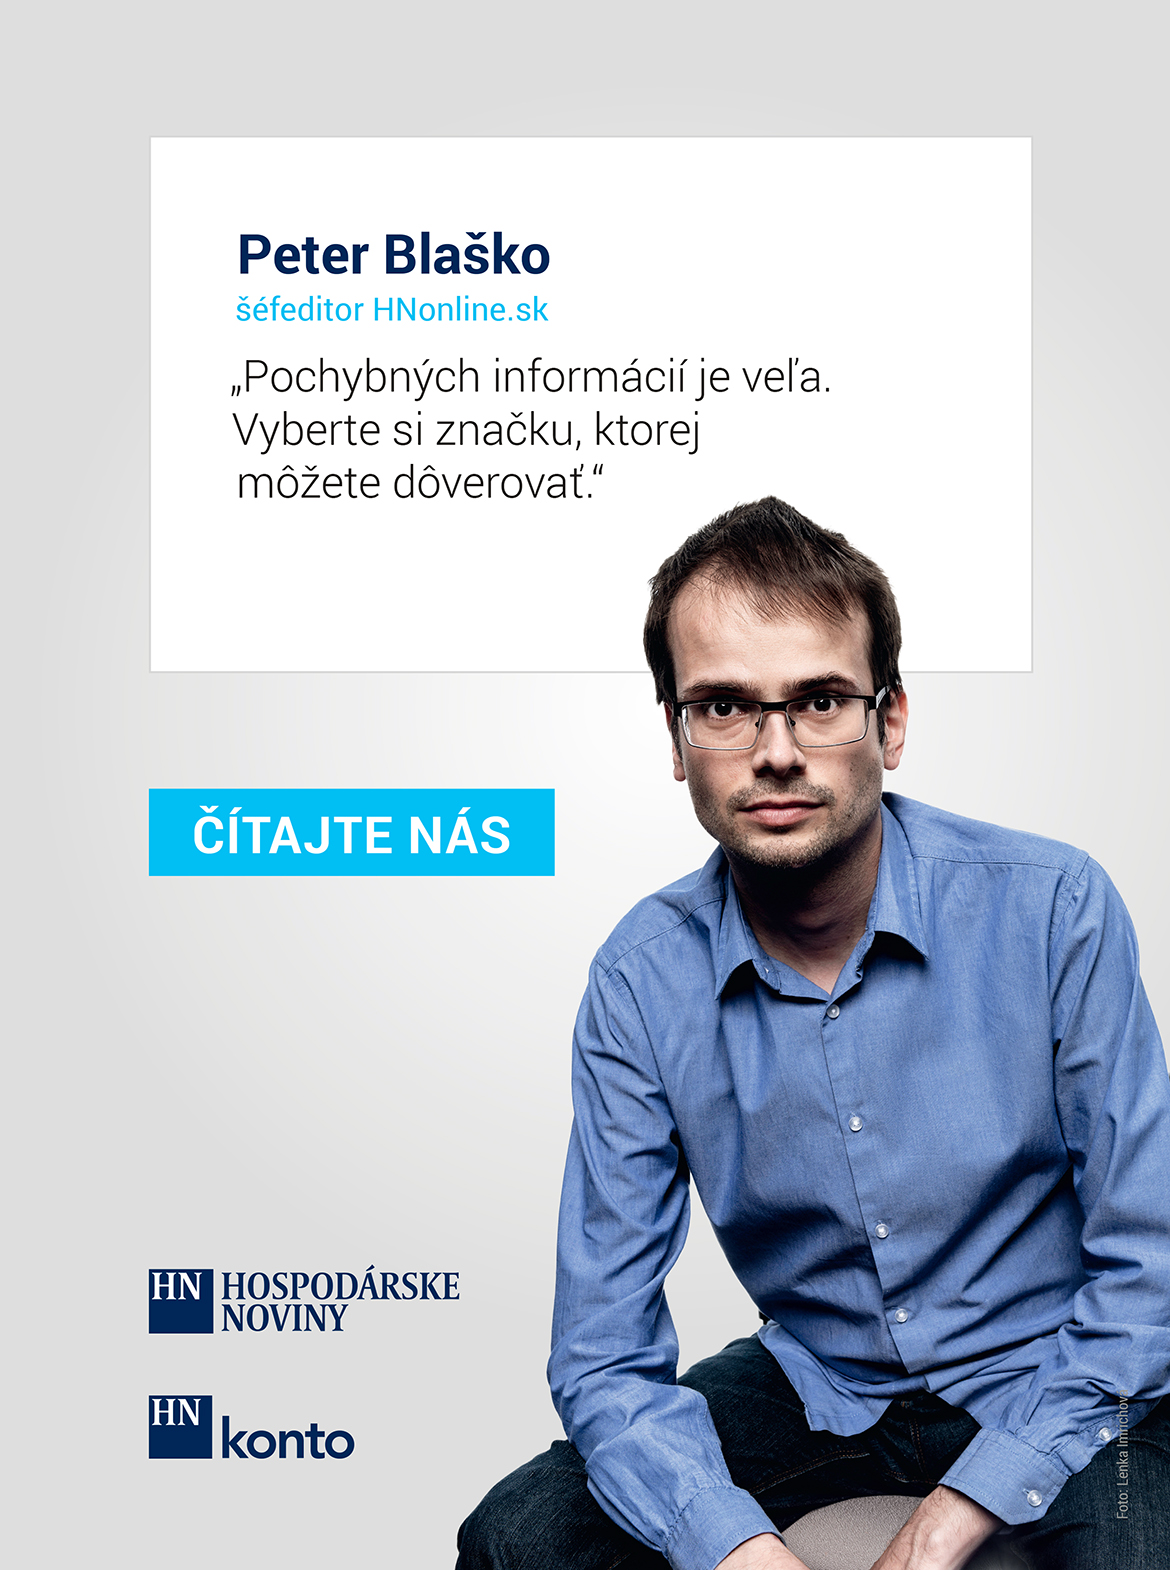 aaHN_konto_ludia_0519_210x285_Blasko_1705